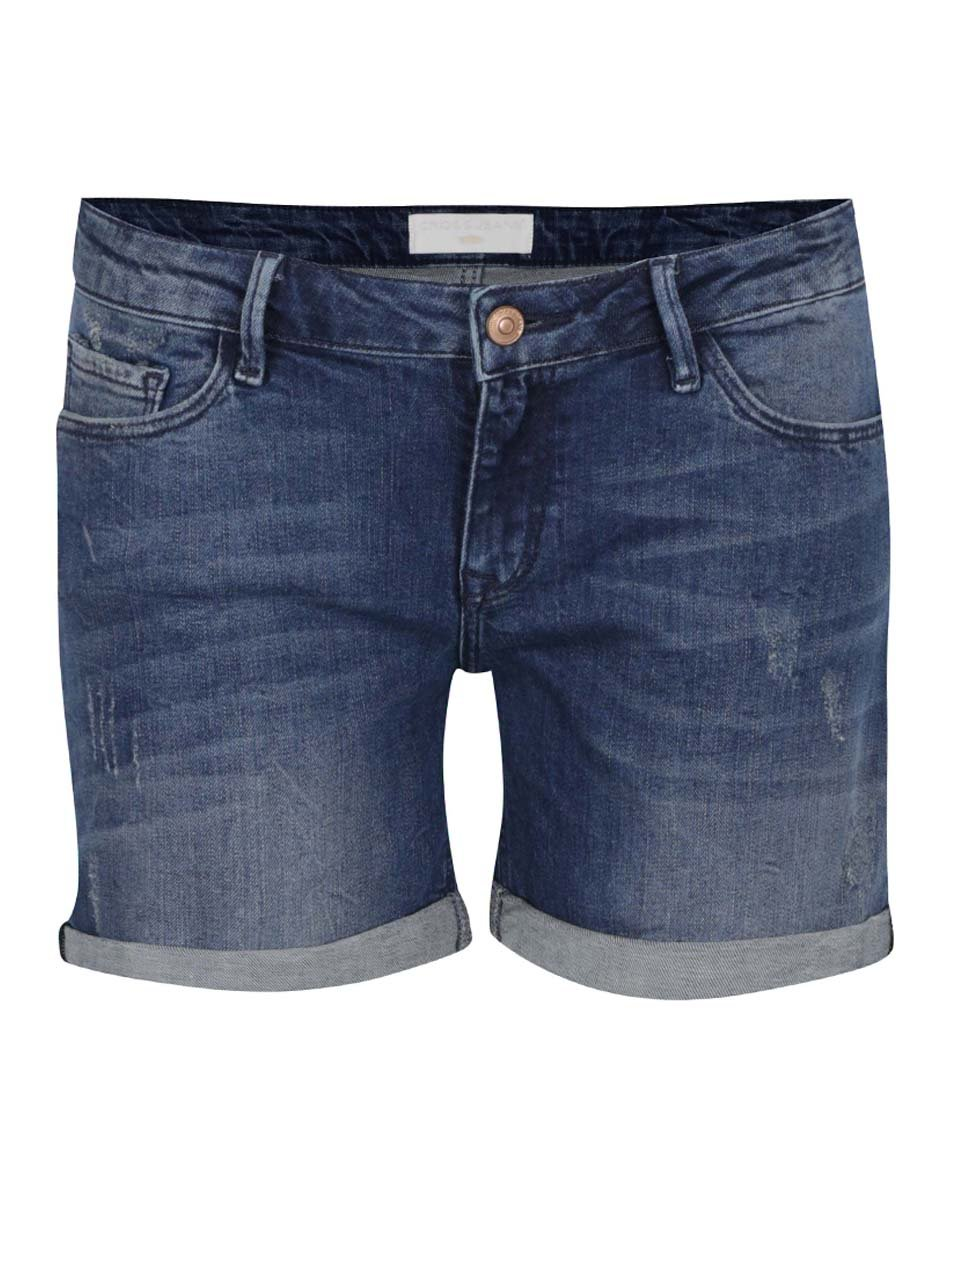 Modré dámské džínové kraťasy Cross Jeans ... 867fdbc4c9